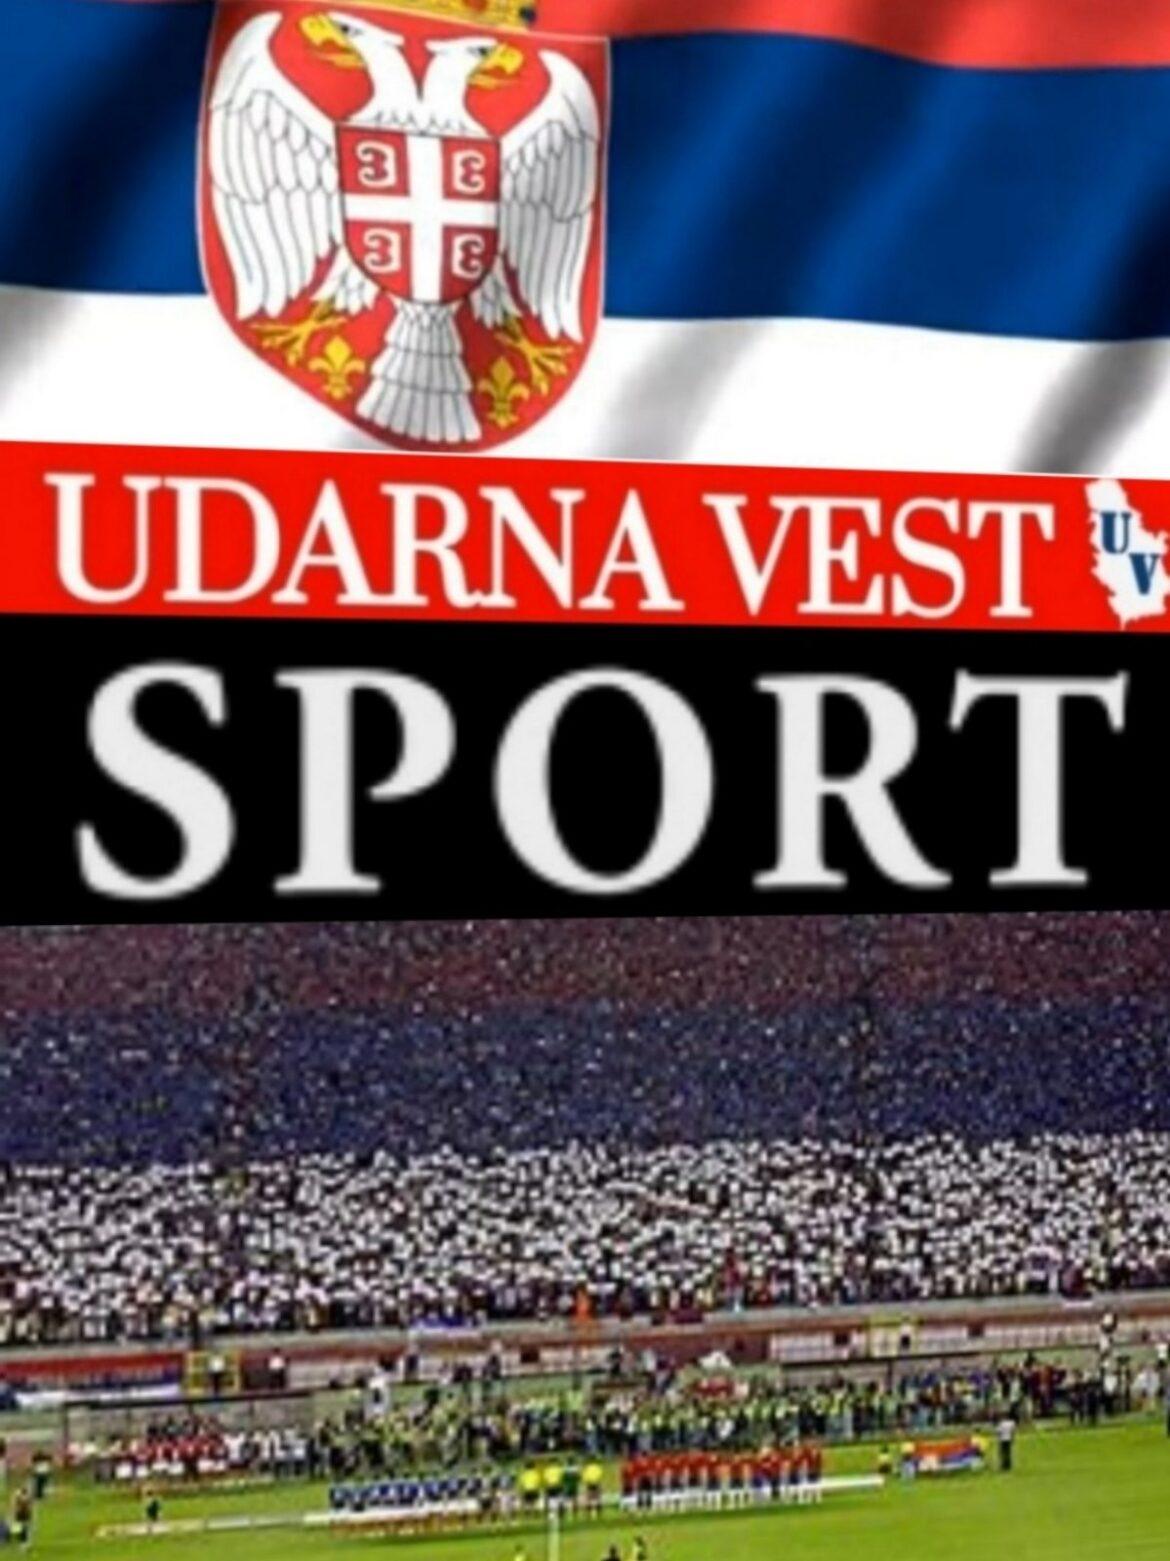 KOŠARKAŠKA BOMBA! Crvena zvezda kupuje igrača od Partizana?!